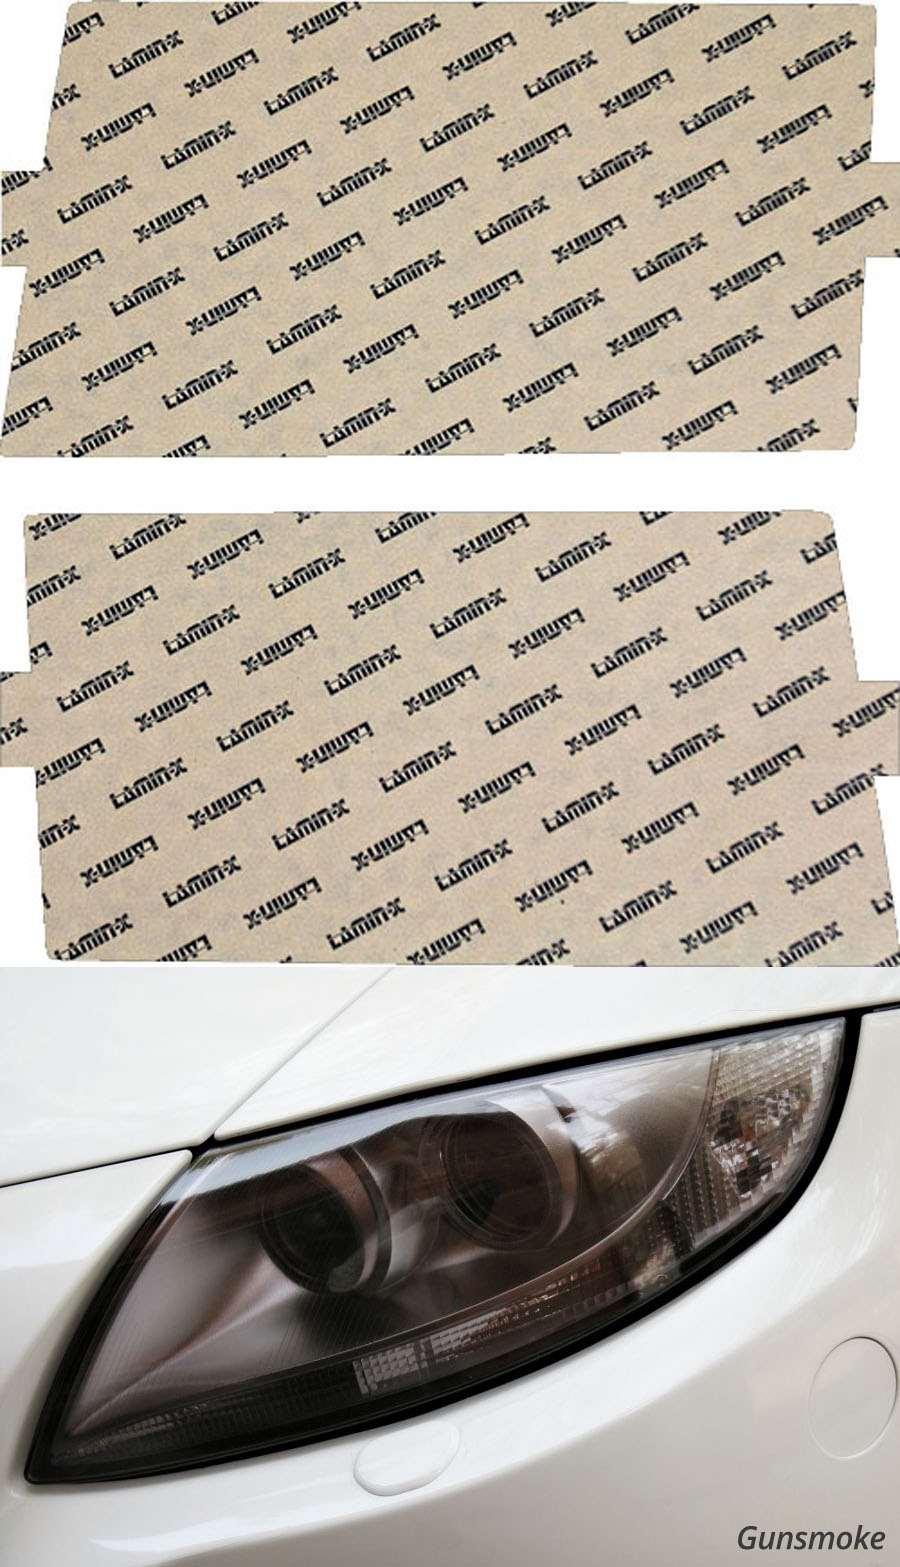 Mercedes E-Class 86-93 Gunsmoke Headlight Covers Lamin-X MB628G